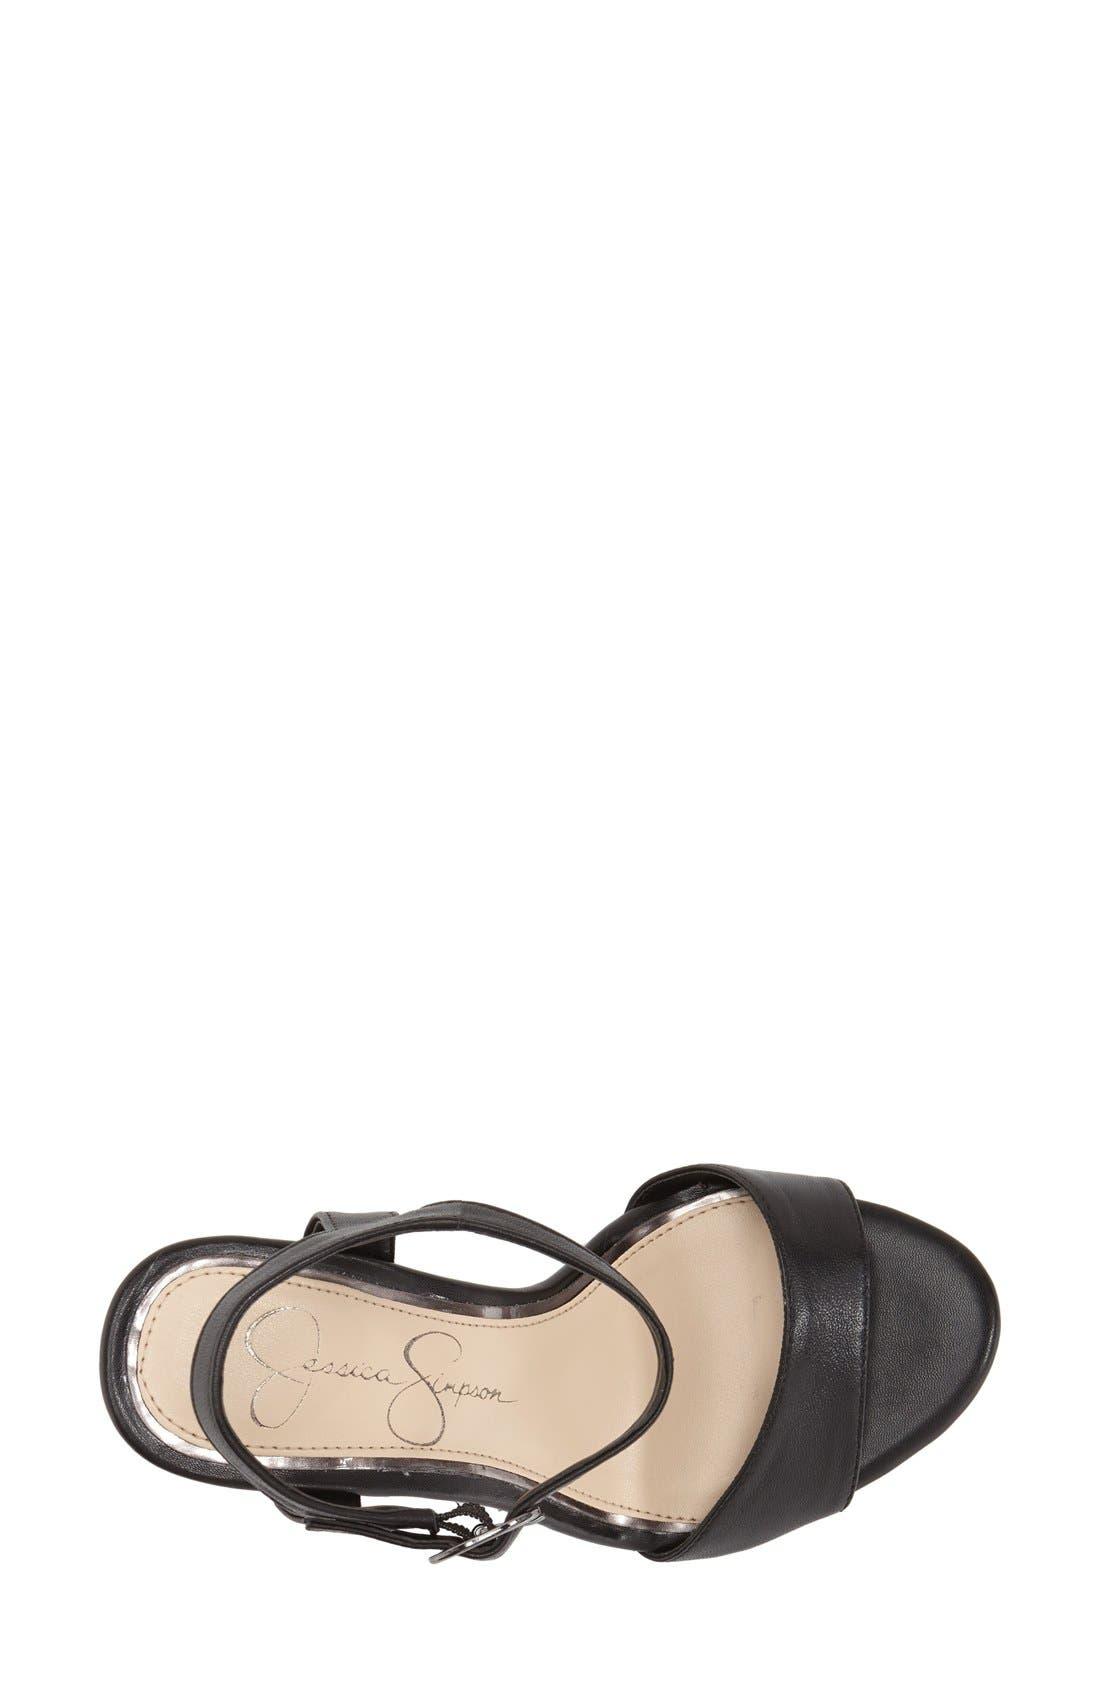 Alternate Image 3  - Jessica Simpson 'Whirl' Platform Sandal (Women)